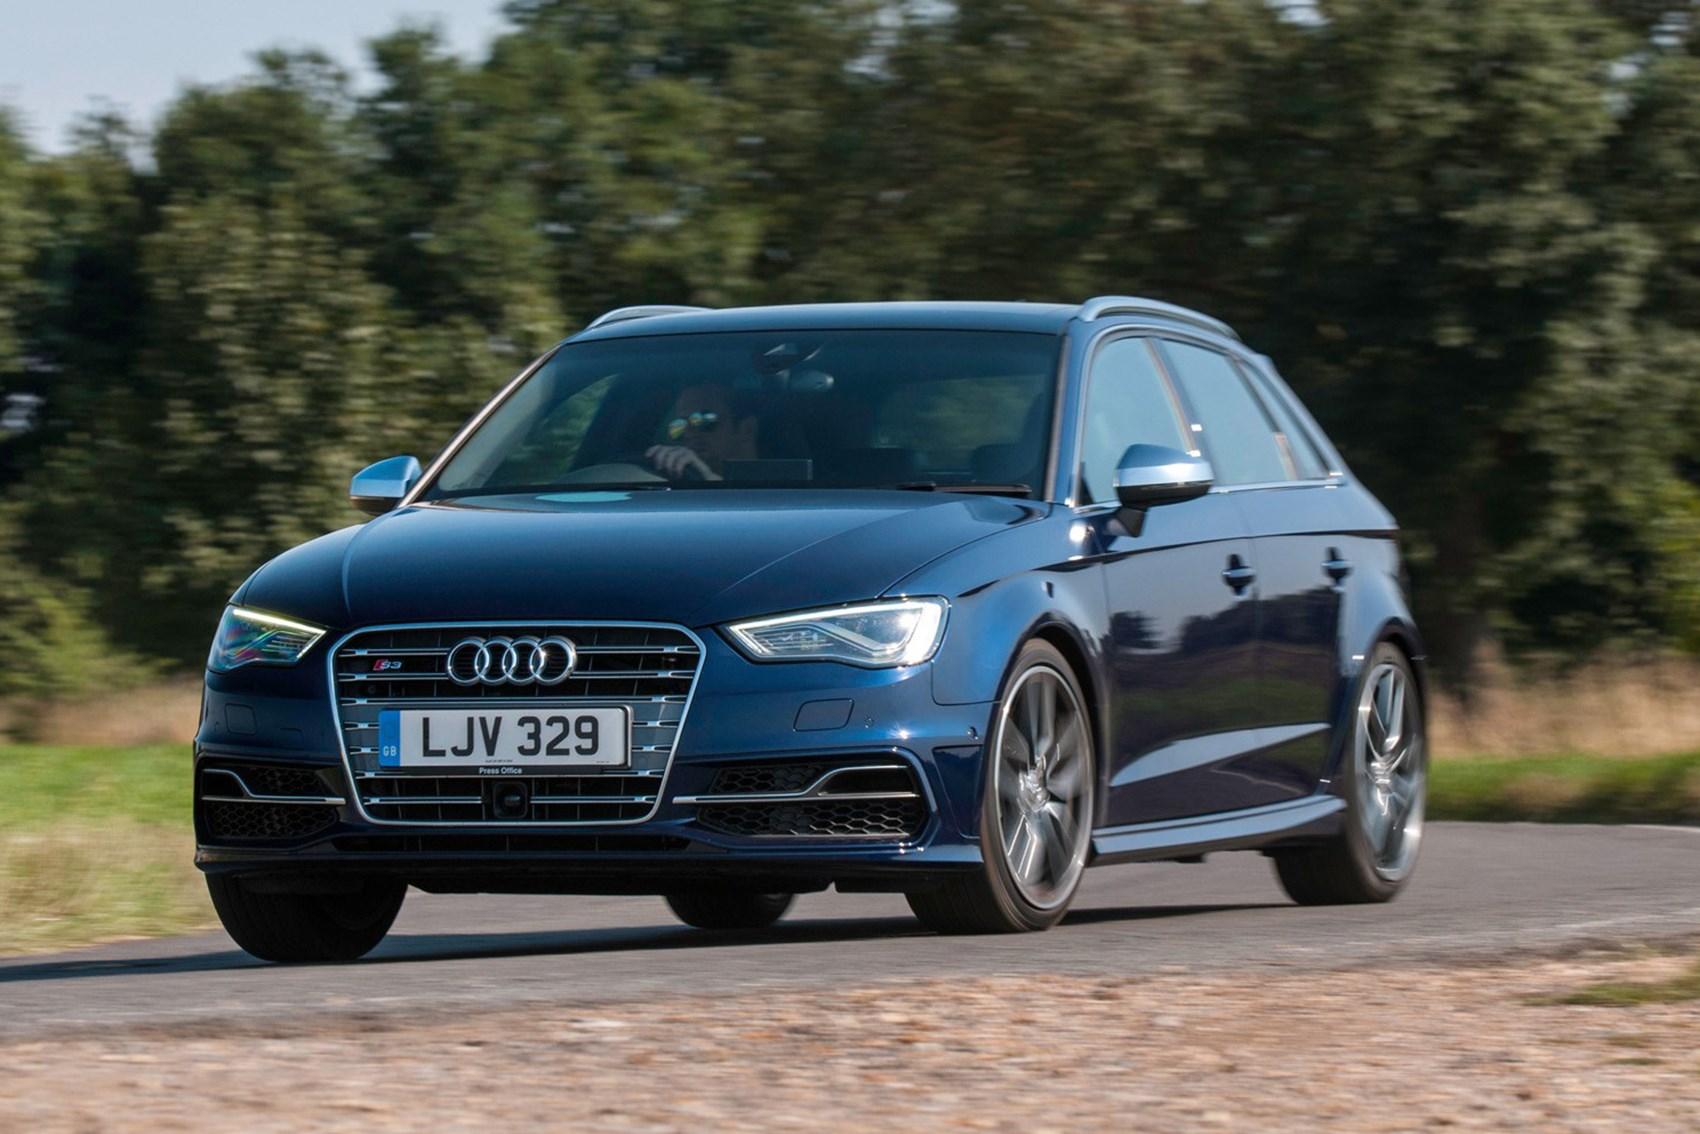 Audi S3 Sportback - the best hot hatchbacks